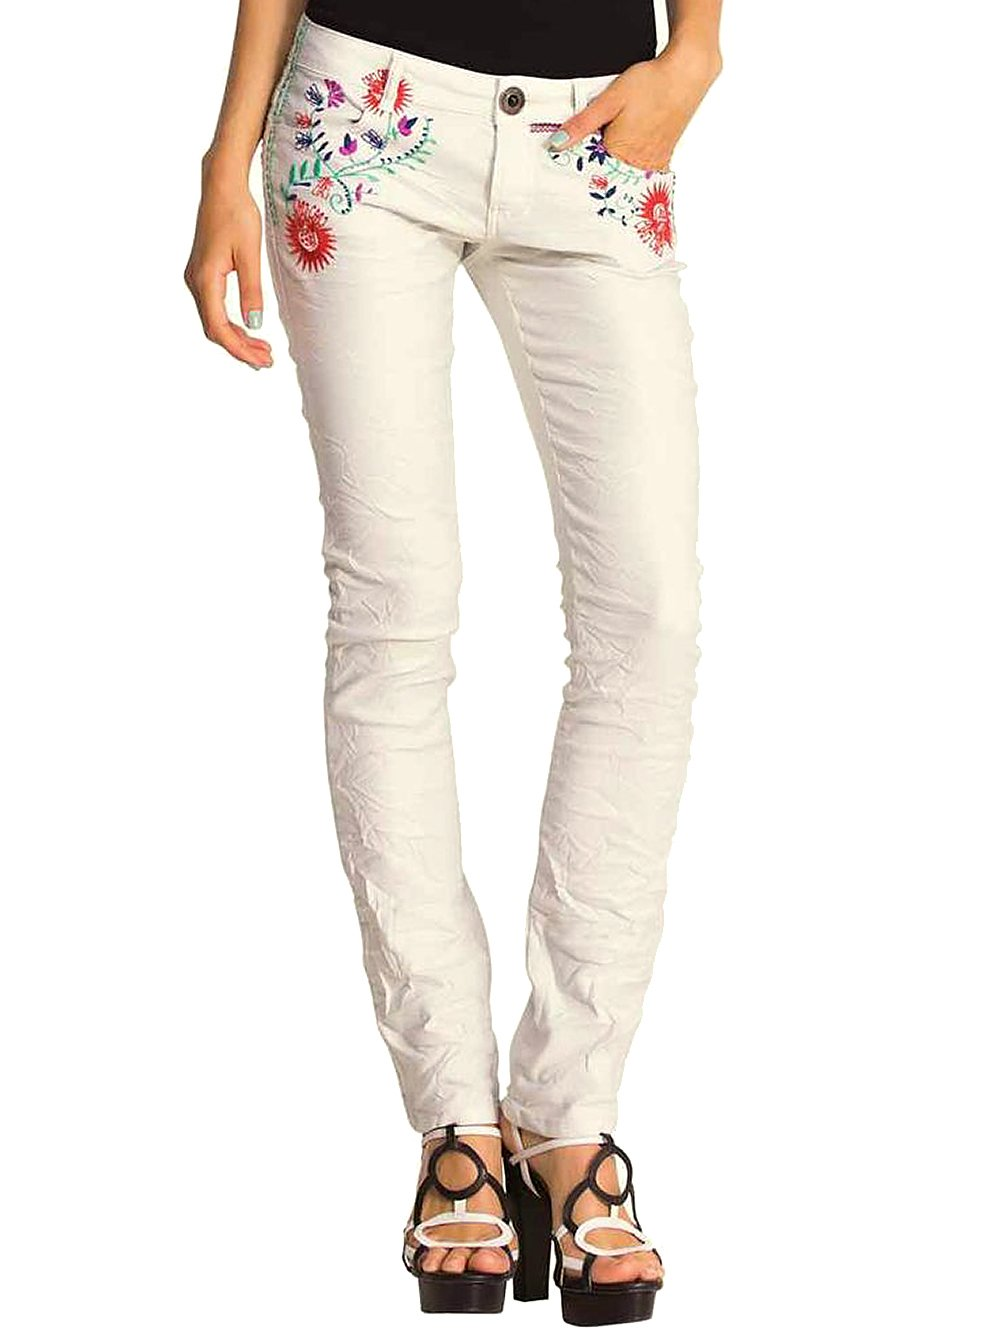 d1e1b5ac9311fa Damen Hose Elsa (weiß) - Desigual 11944 - Hose günstig online kaufen ...